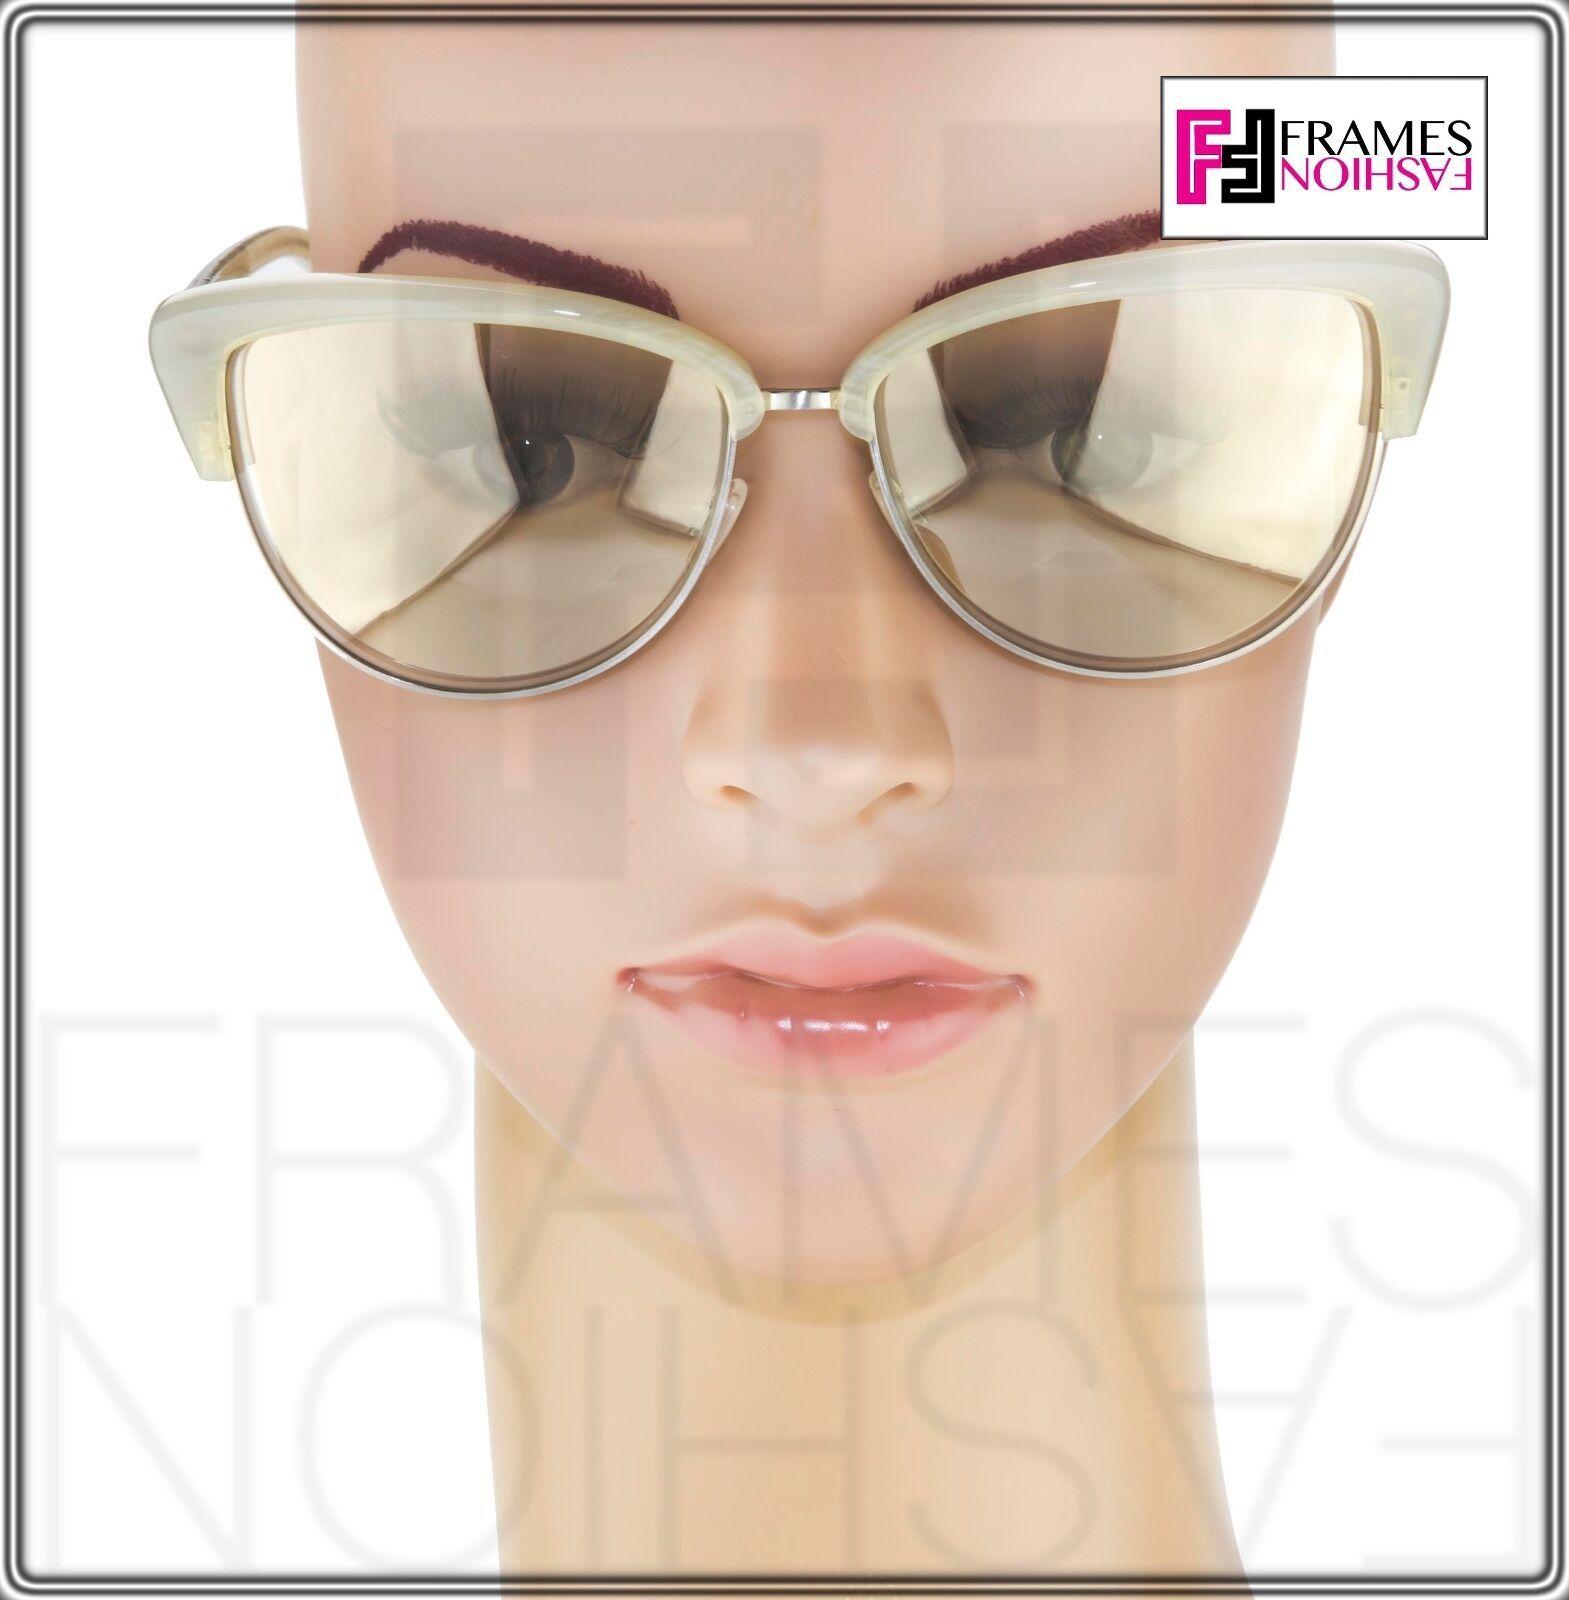 OLIVER PEOPLES ALISHA OV5244S White Pearl Flash Mirrored Sunglasses 5244 Women image 3